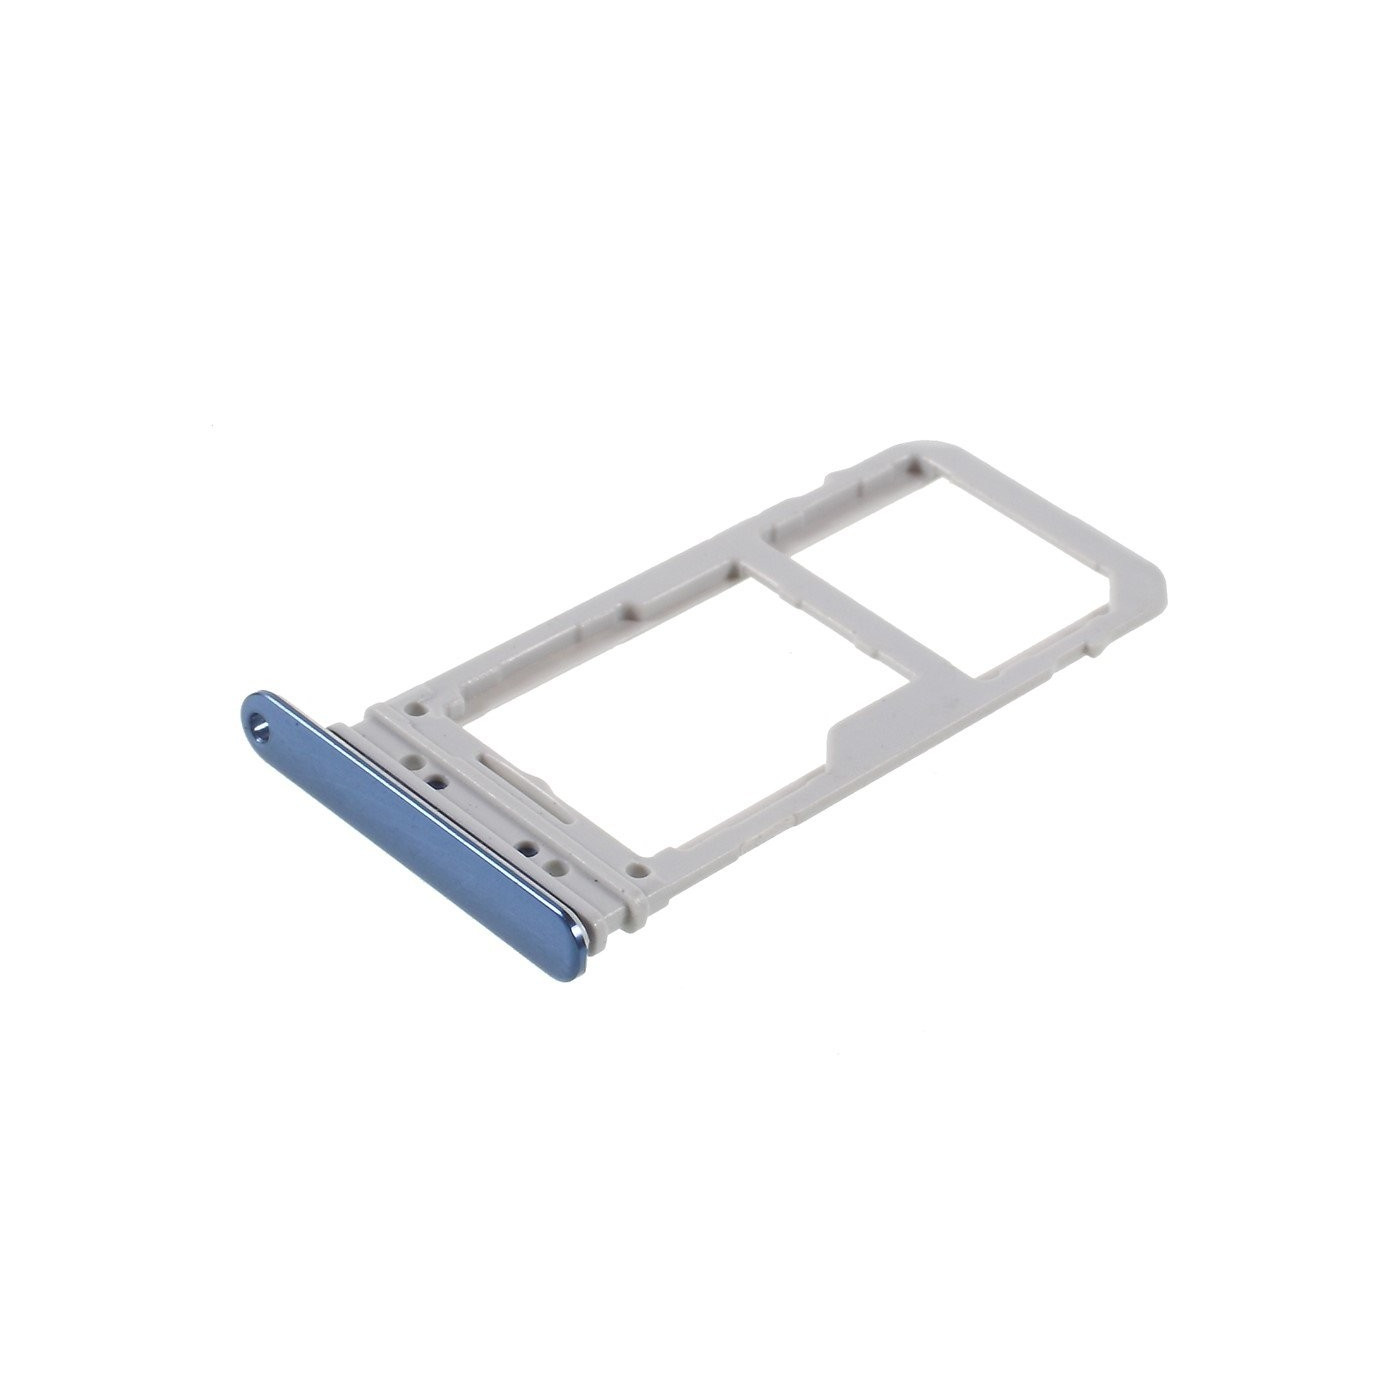 SIM Holder for Samsung Note 8 N950F Blue Slot Sled